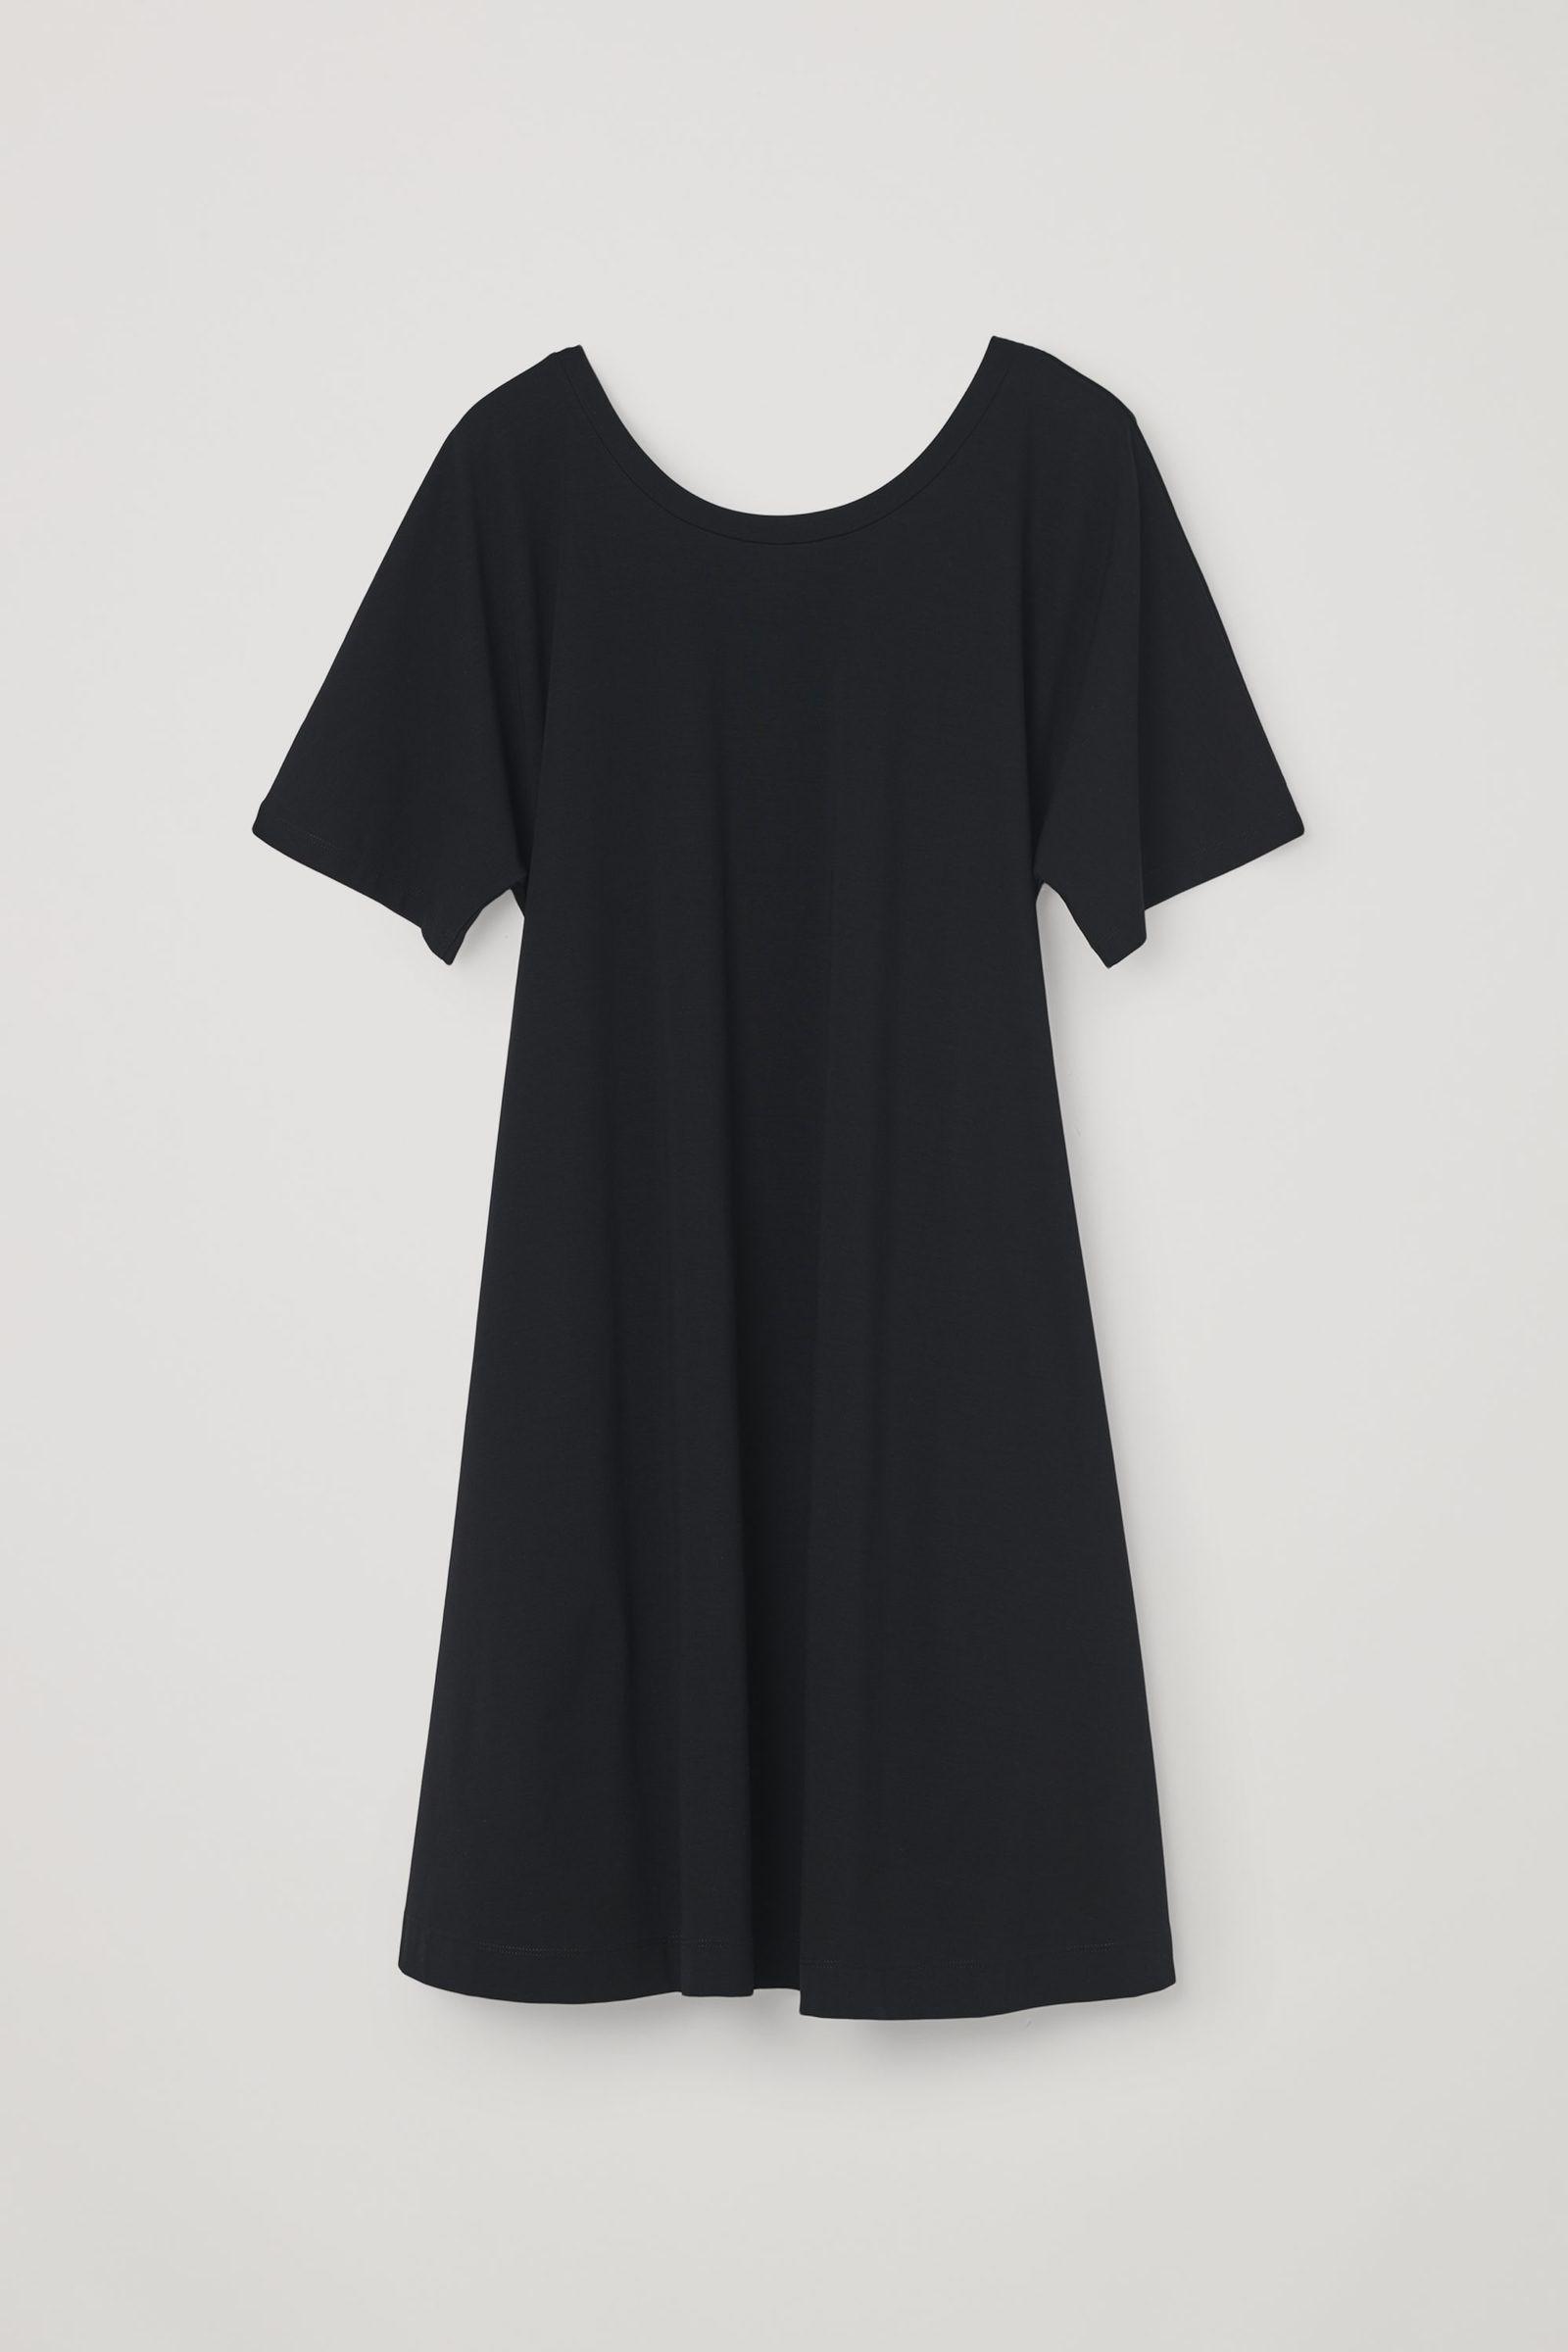 COS A라인 코튼 드레스의 블랙컬러 Product입니다.